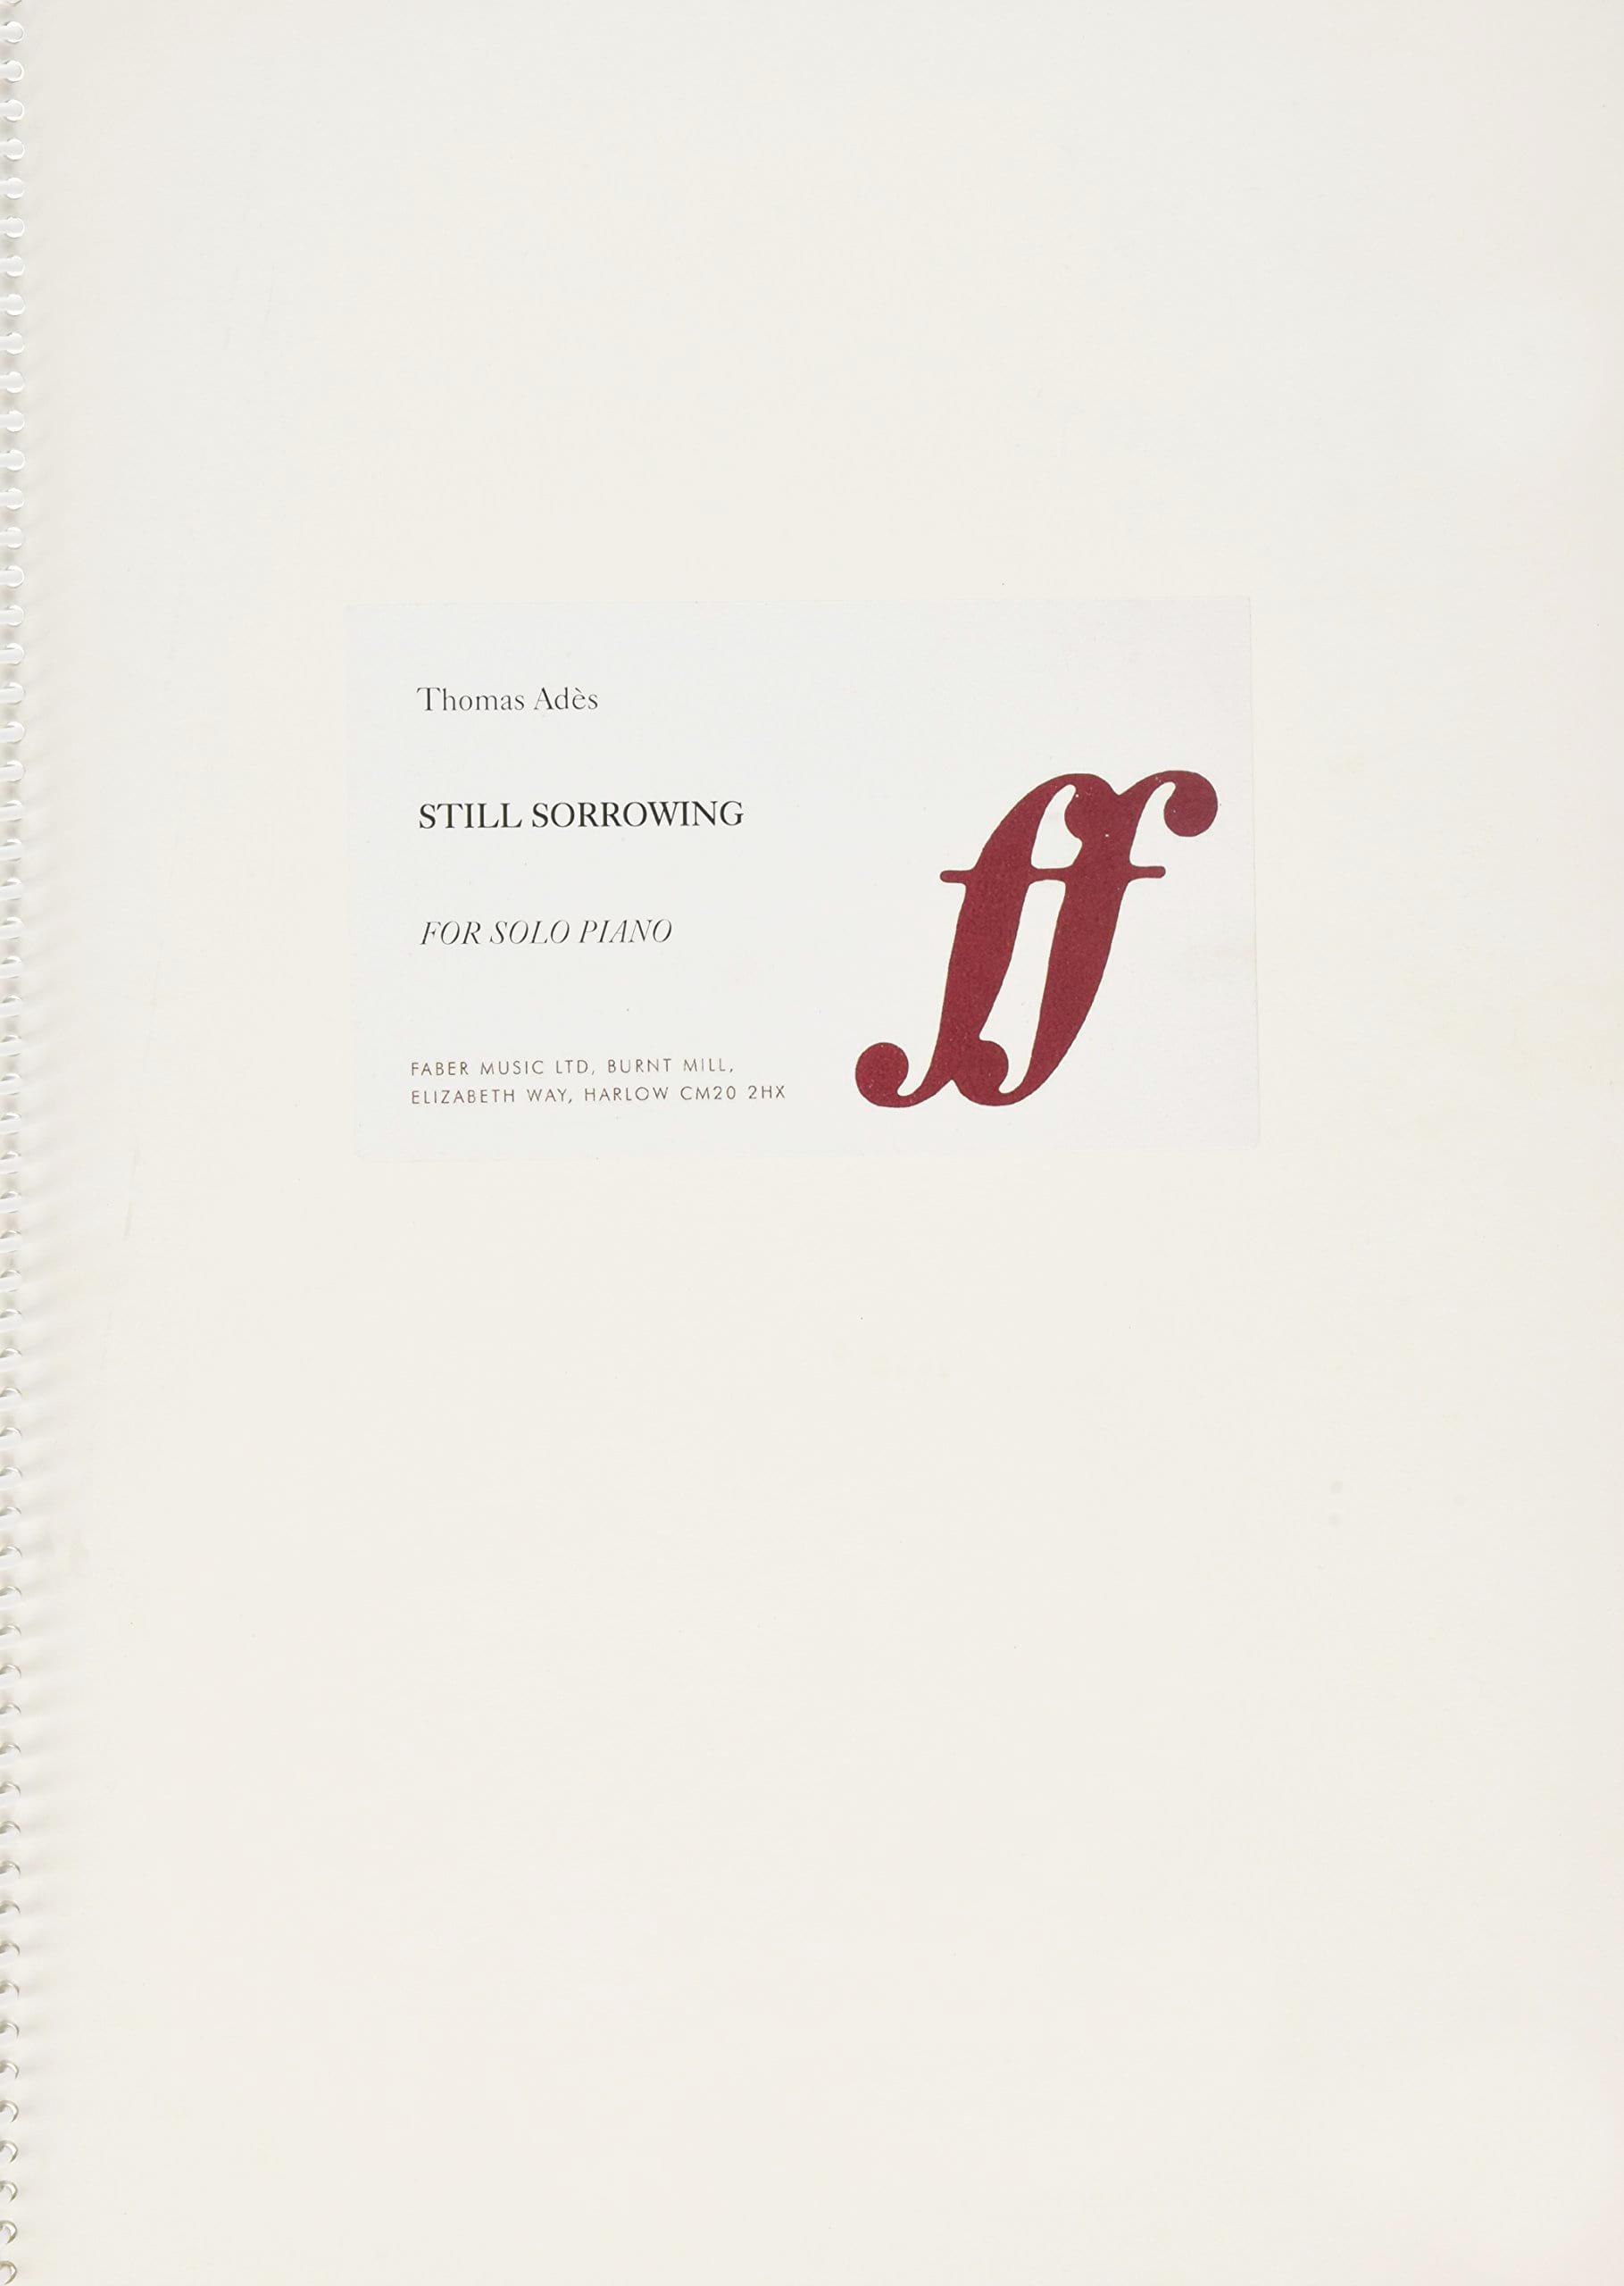 Still Sorrowing - Thomas Adès - Partition - Piano - laflutedepan.com